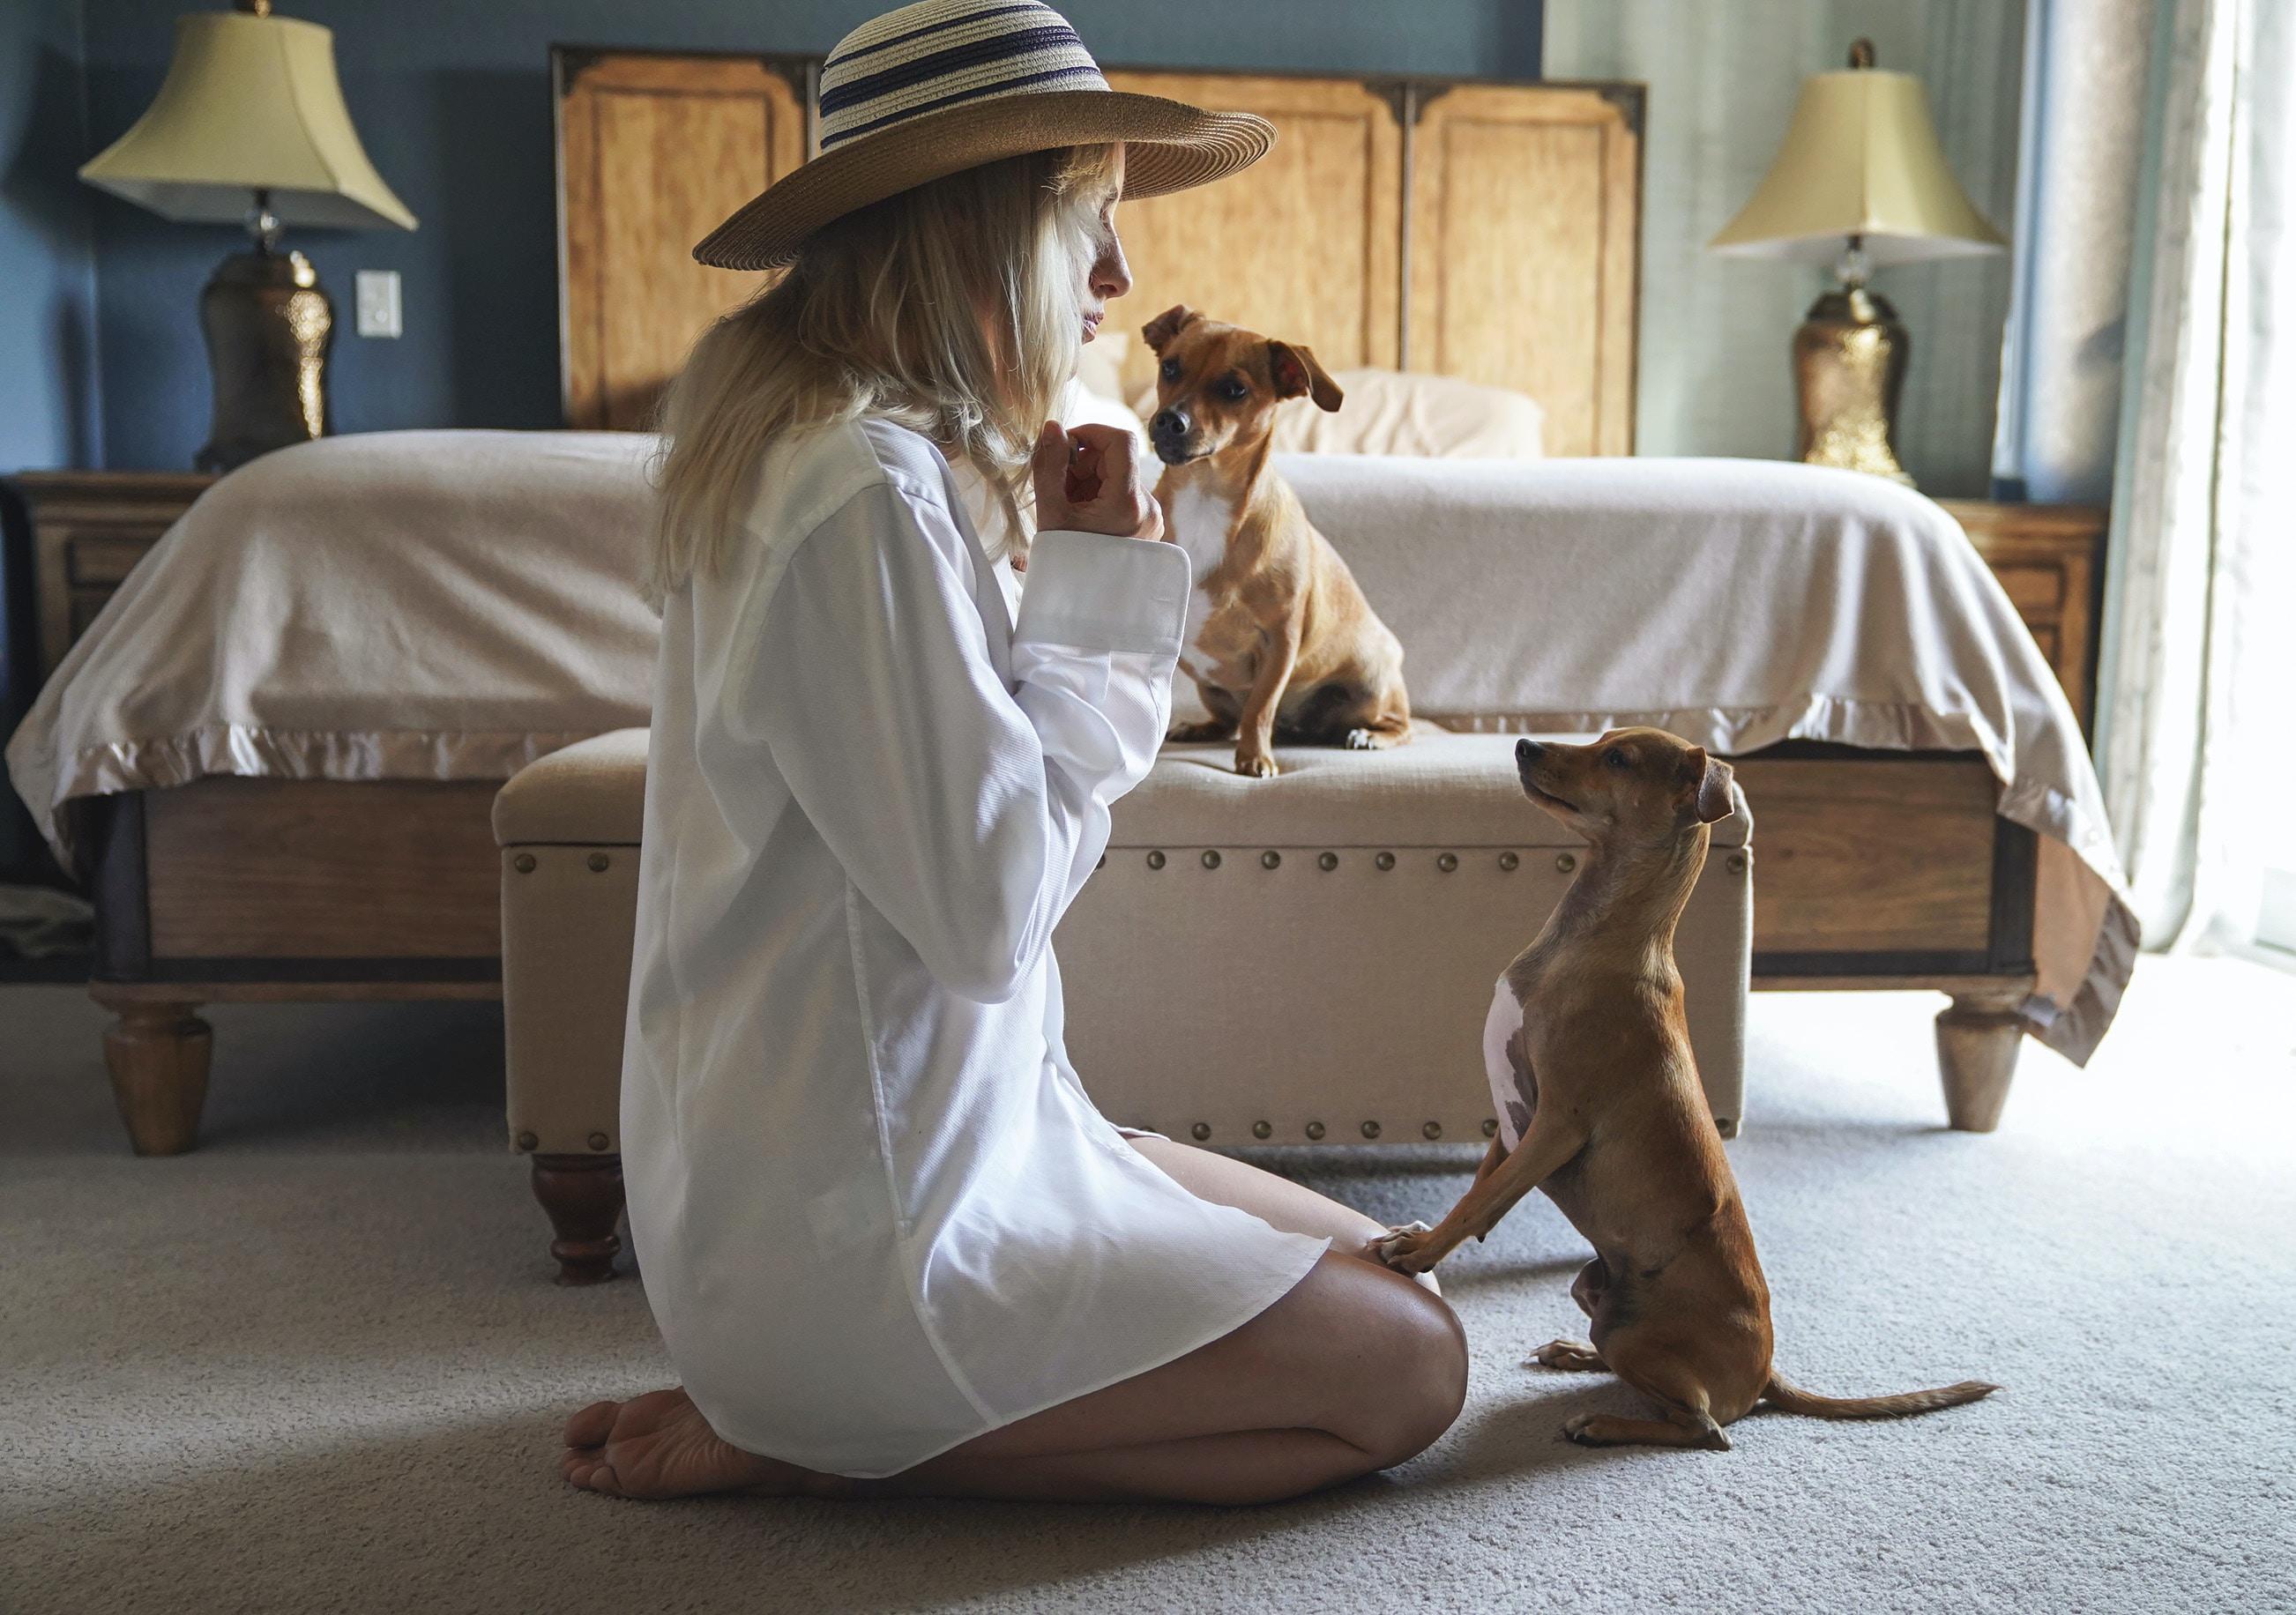 woman sitting beside tan dog